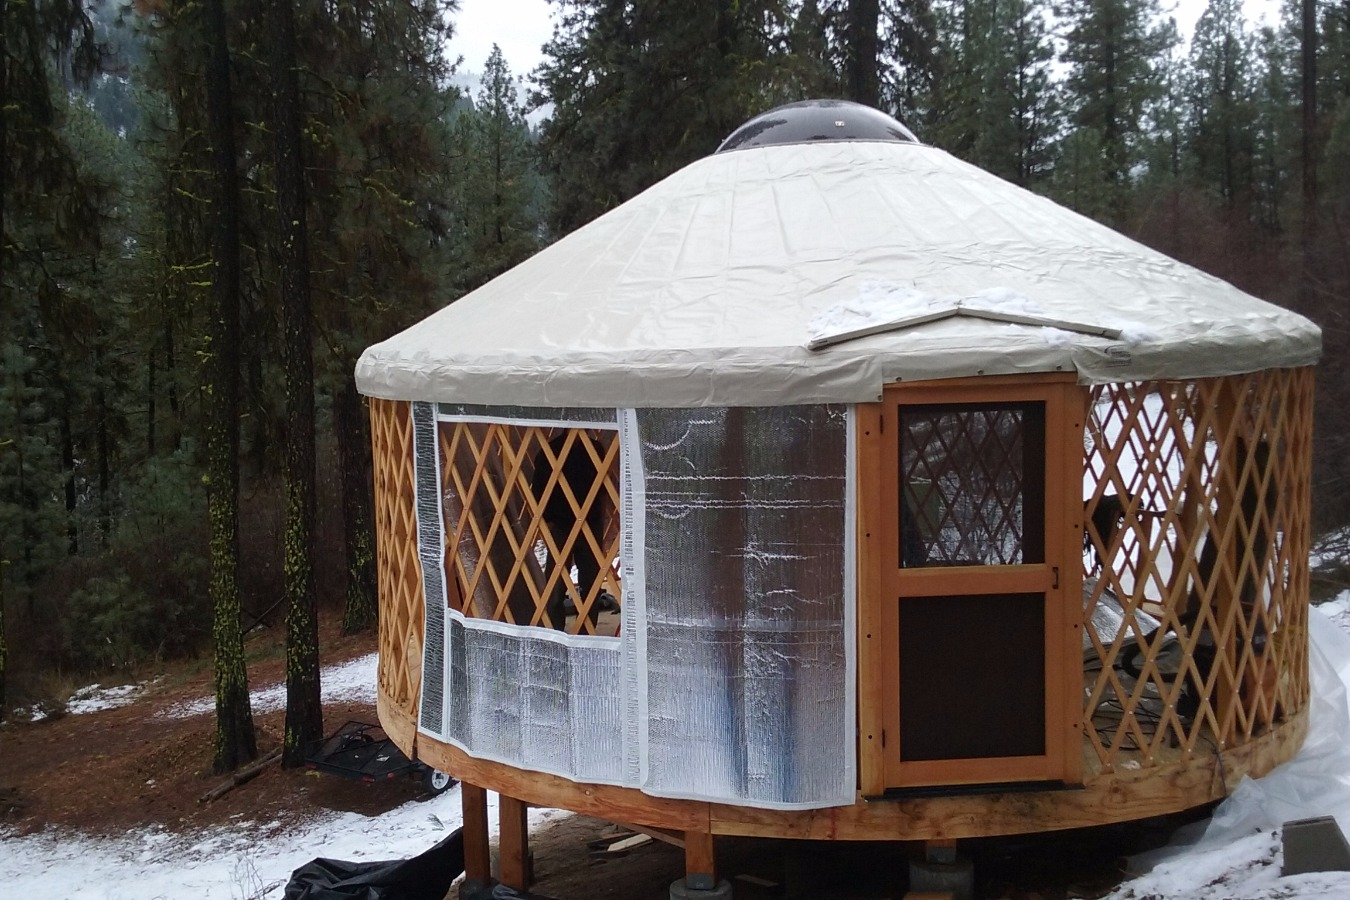 Insulation is key in Idaho